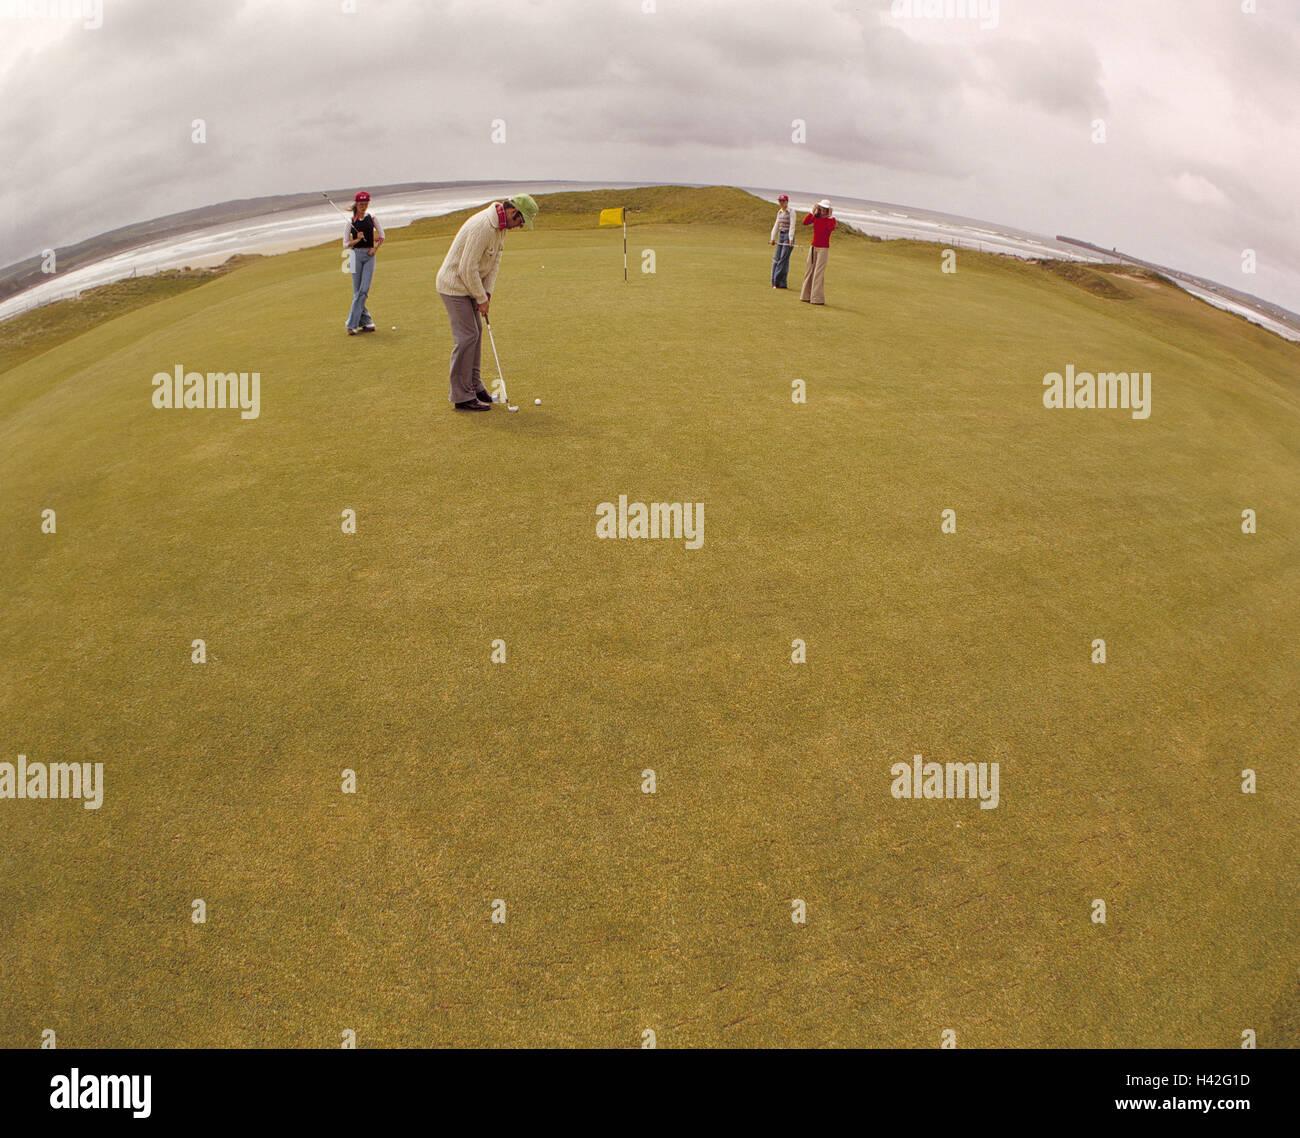 Golf course, Golspieler, Fisheye, no model release!, Europe, Nordwesteuropa, Irishman's country, Westirland, - Stock Image